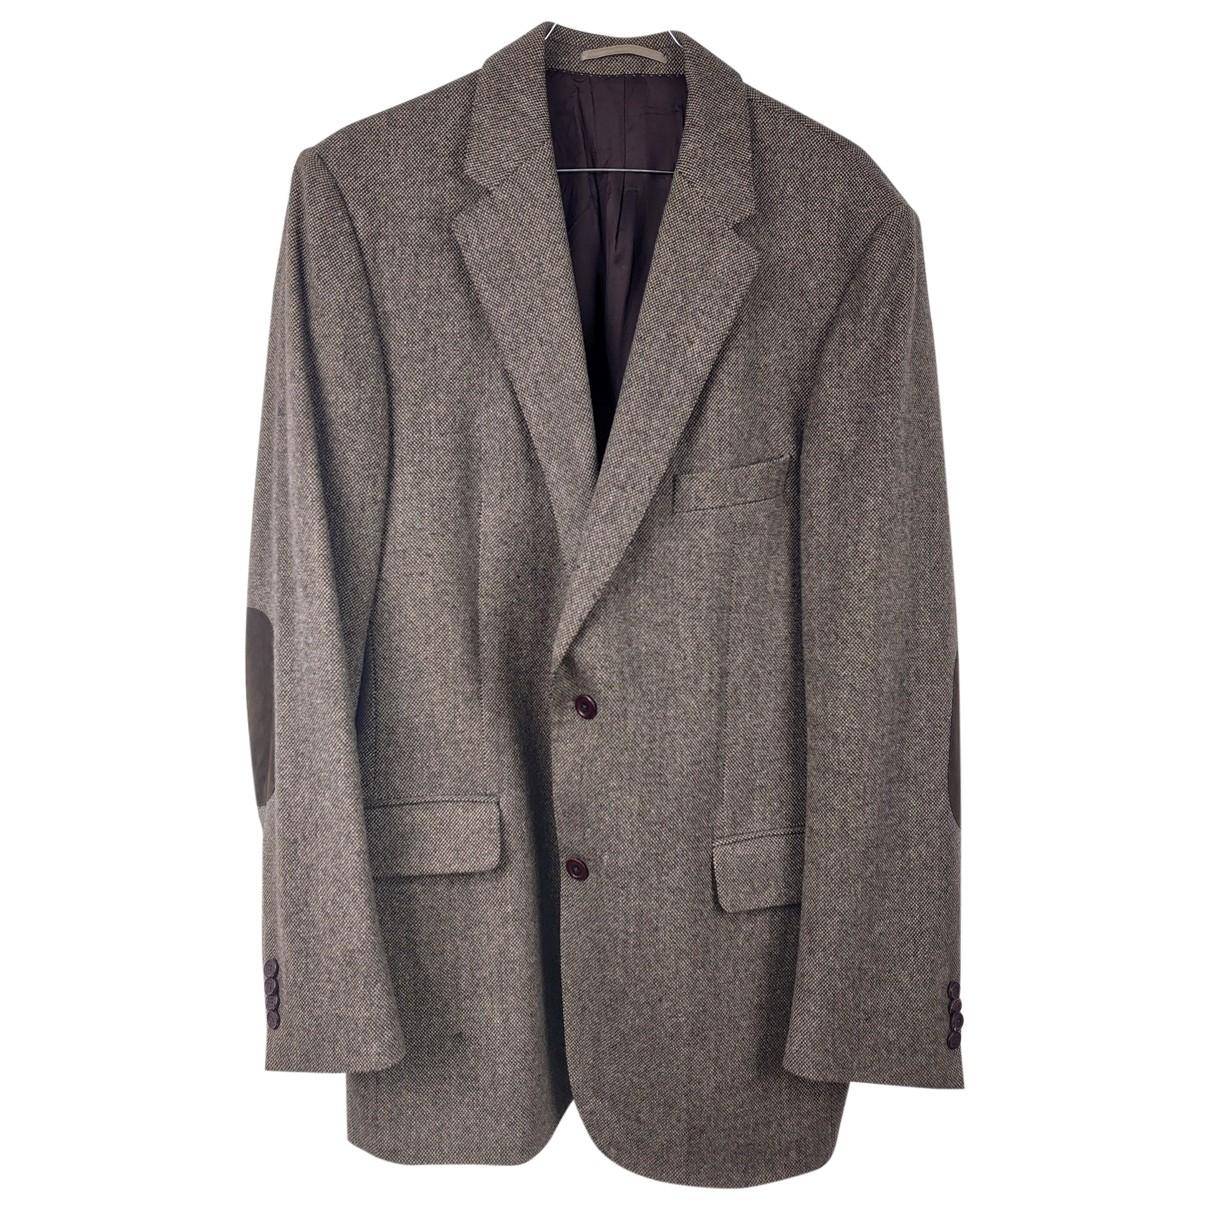 Burberry \N Grey Wool jacket  for Men L International